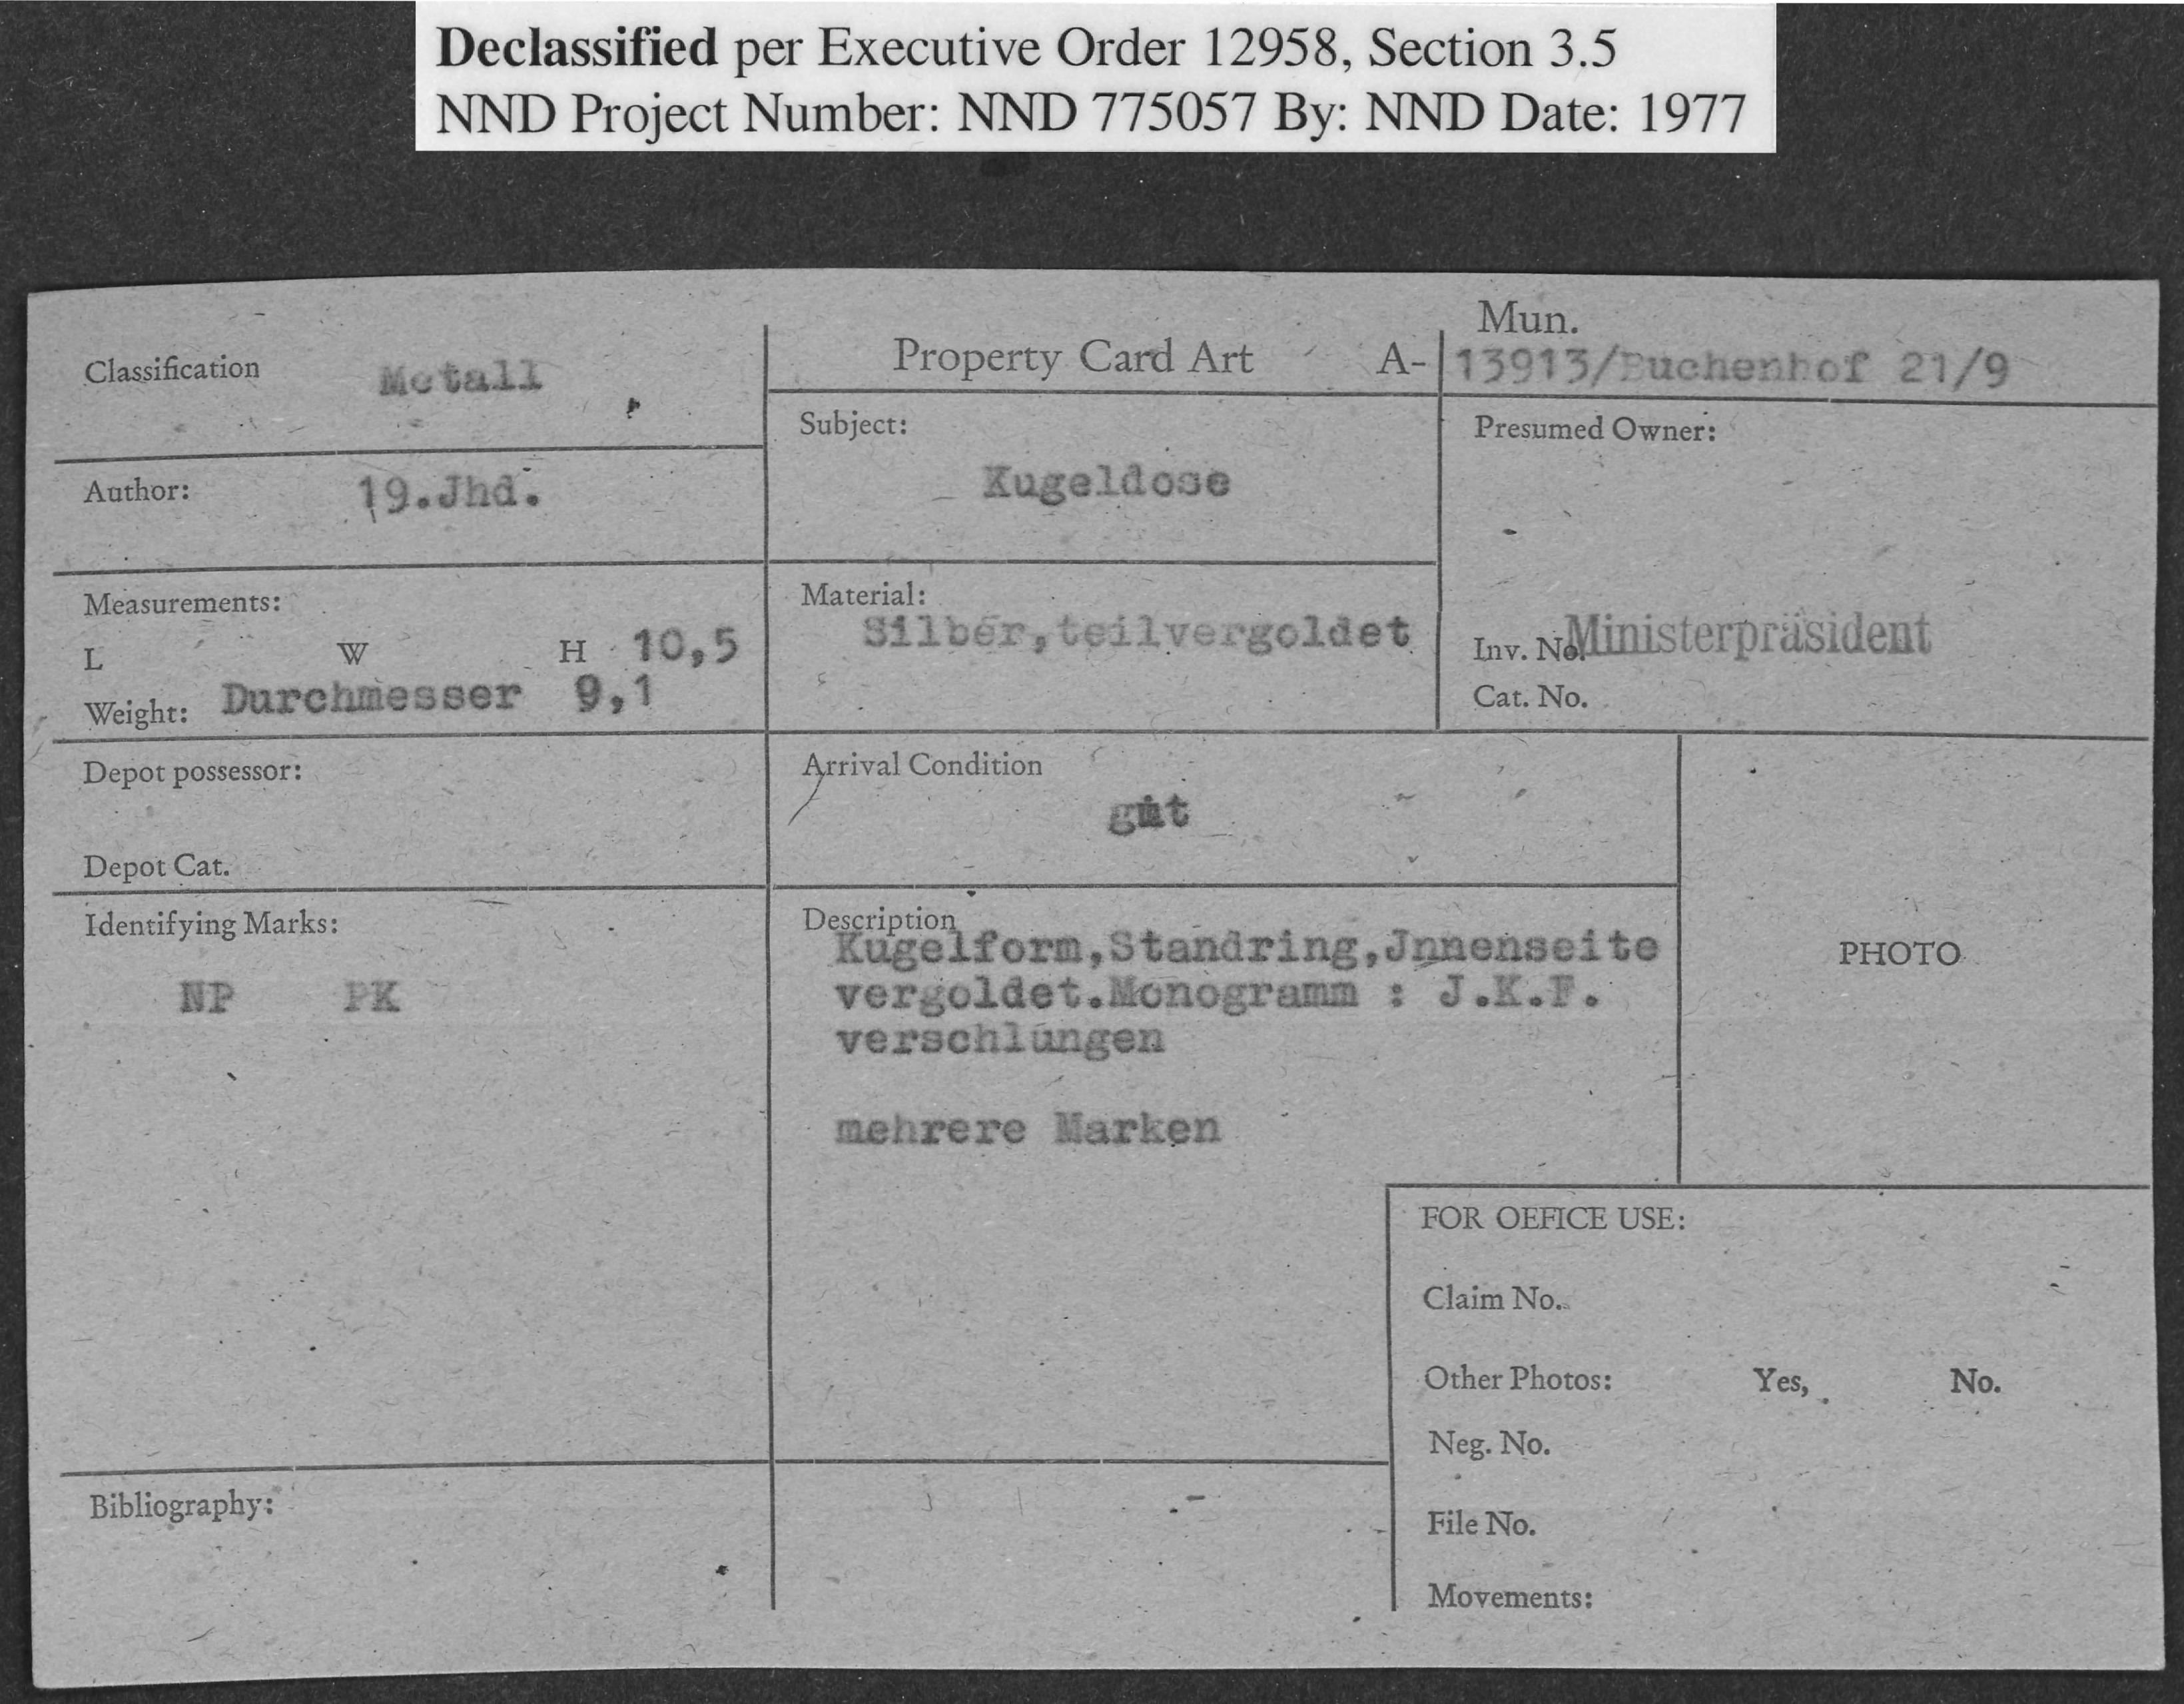 Metall: Kugeldose, Property Card Number 13913/buchenhof 21/9